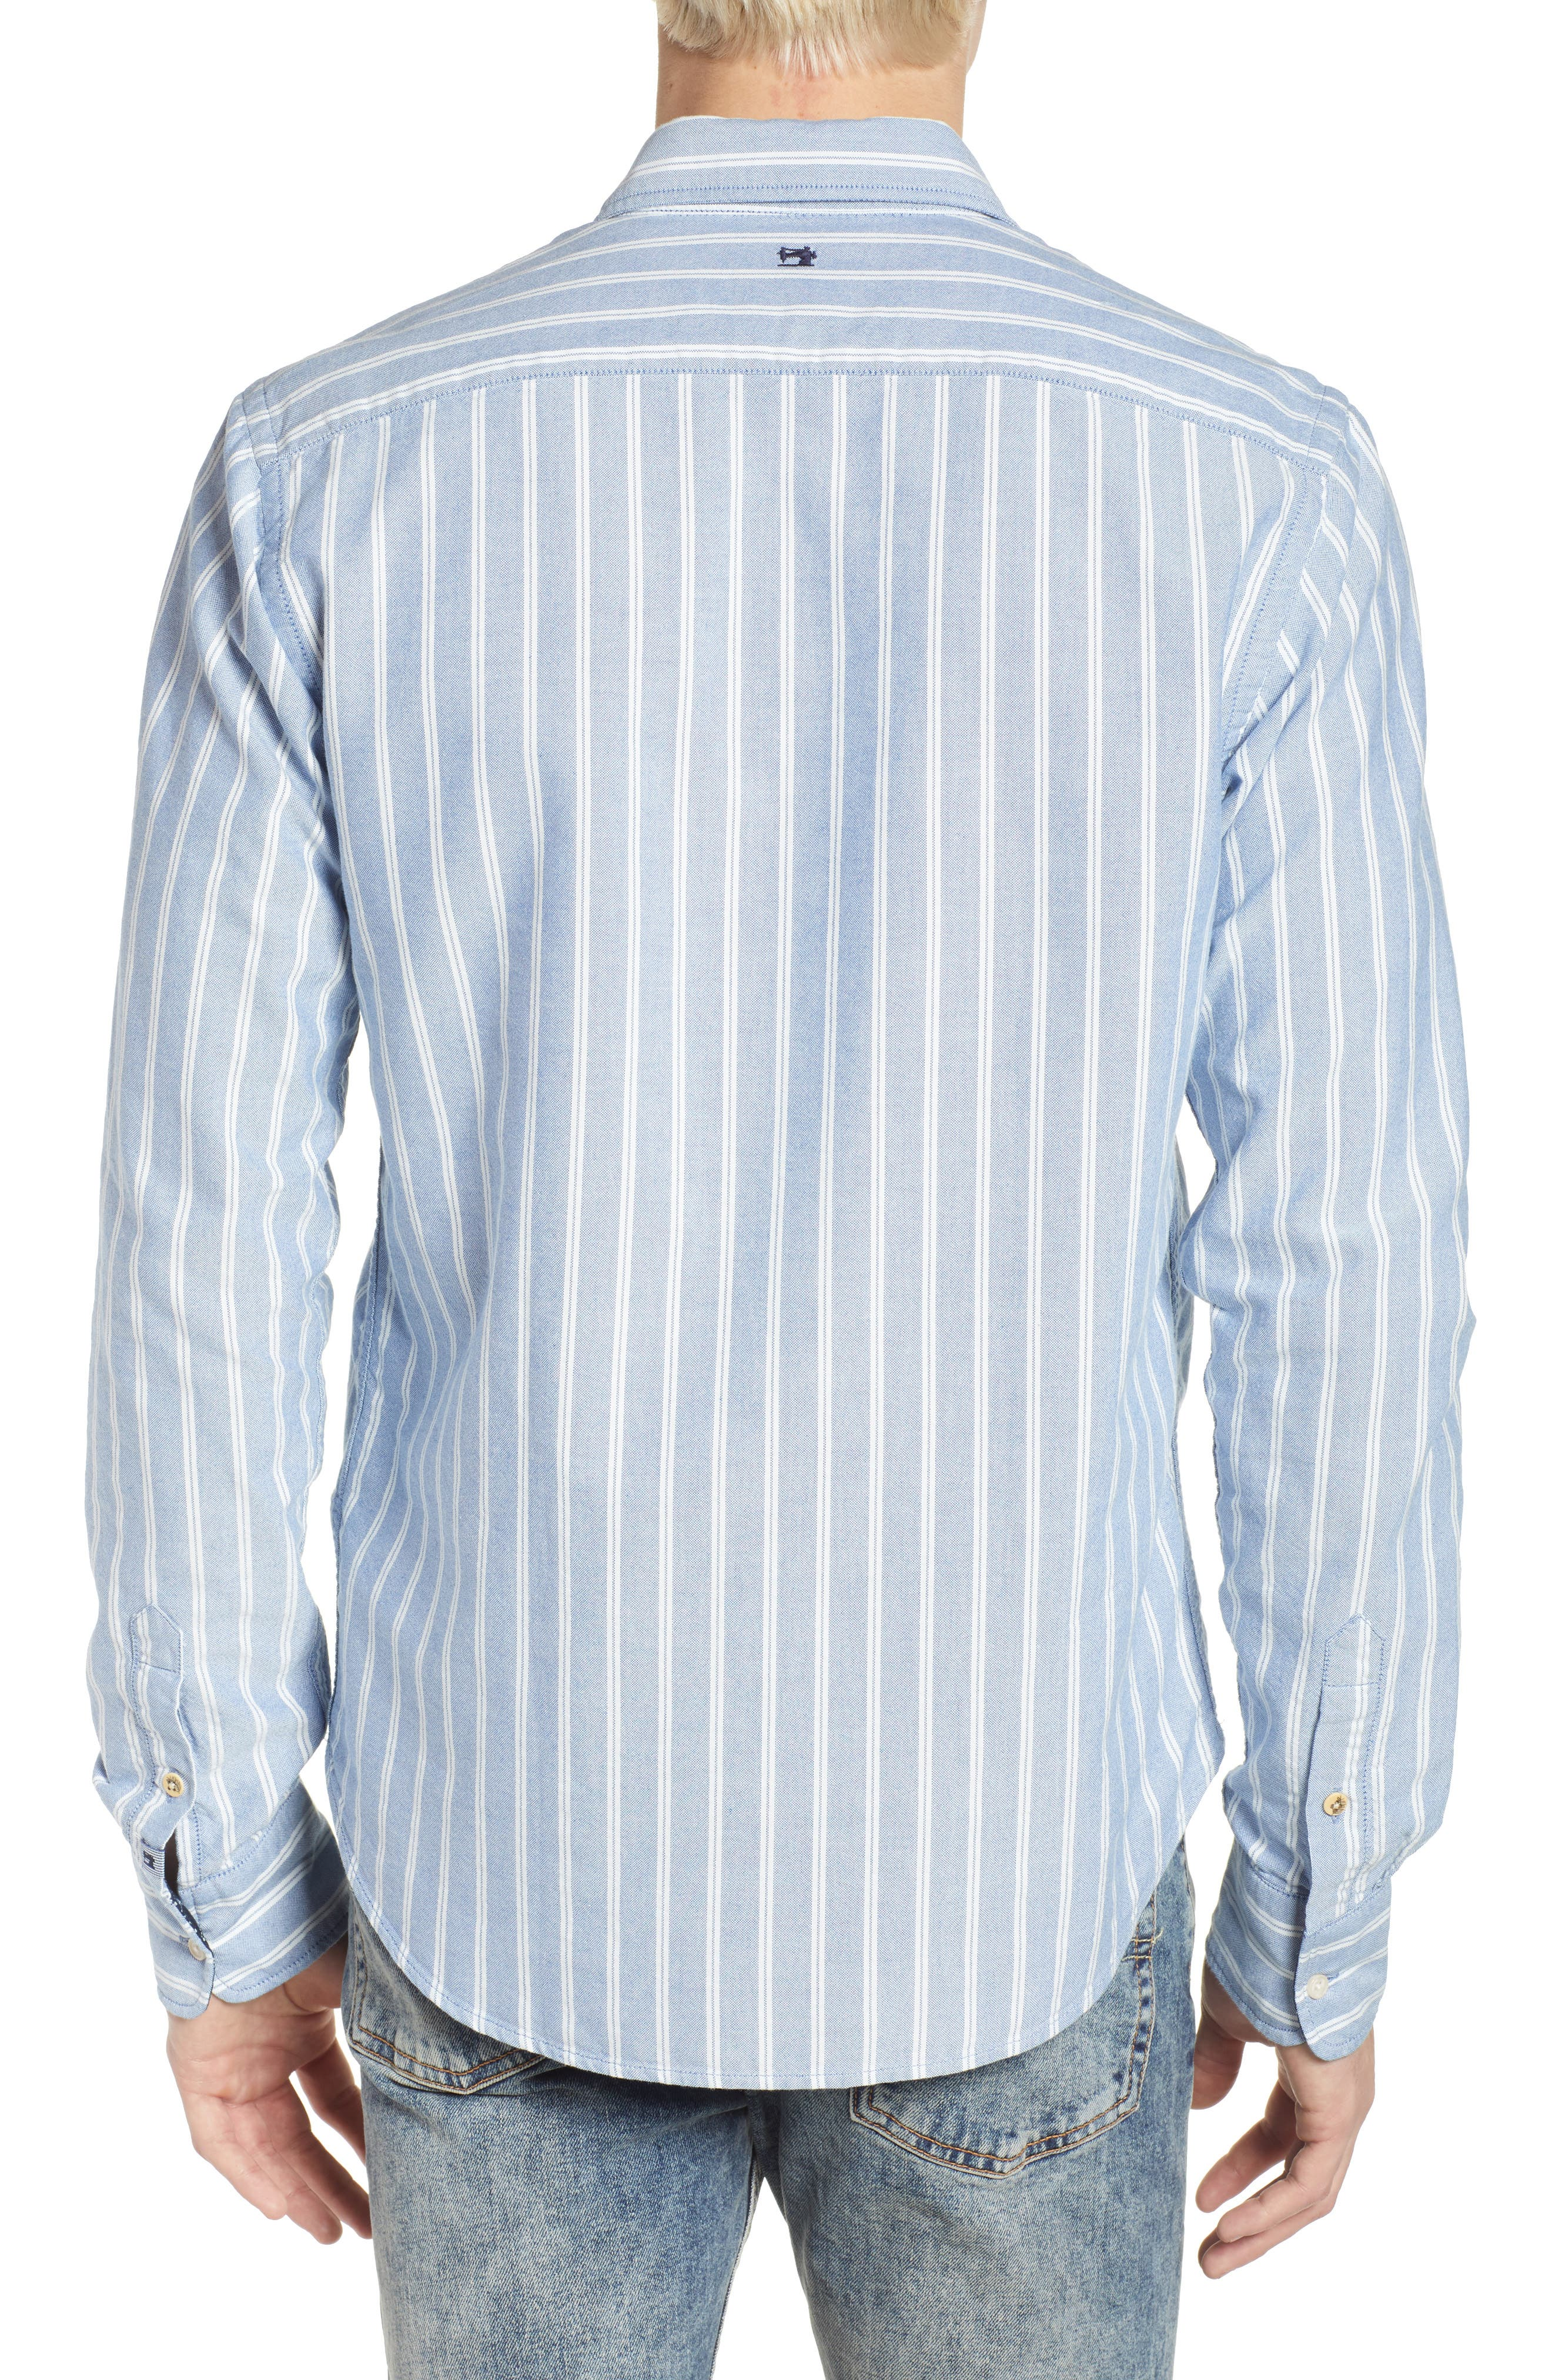 Oxford Shirt,                             Alternate thumbnail 3, color,                             Combo A